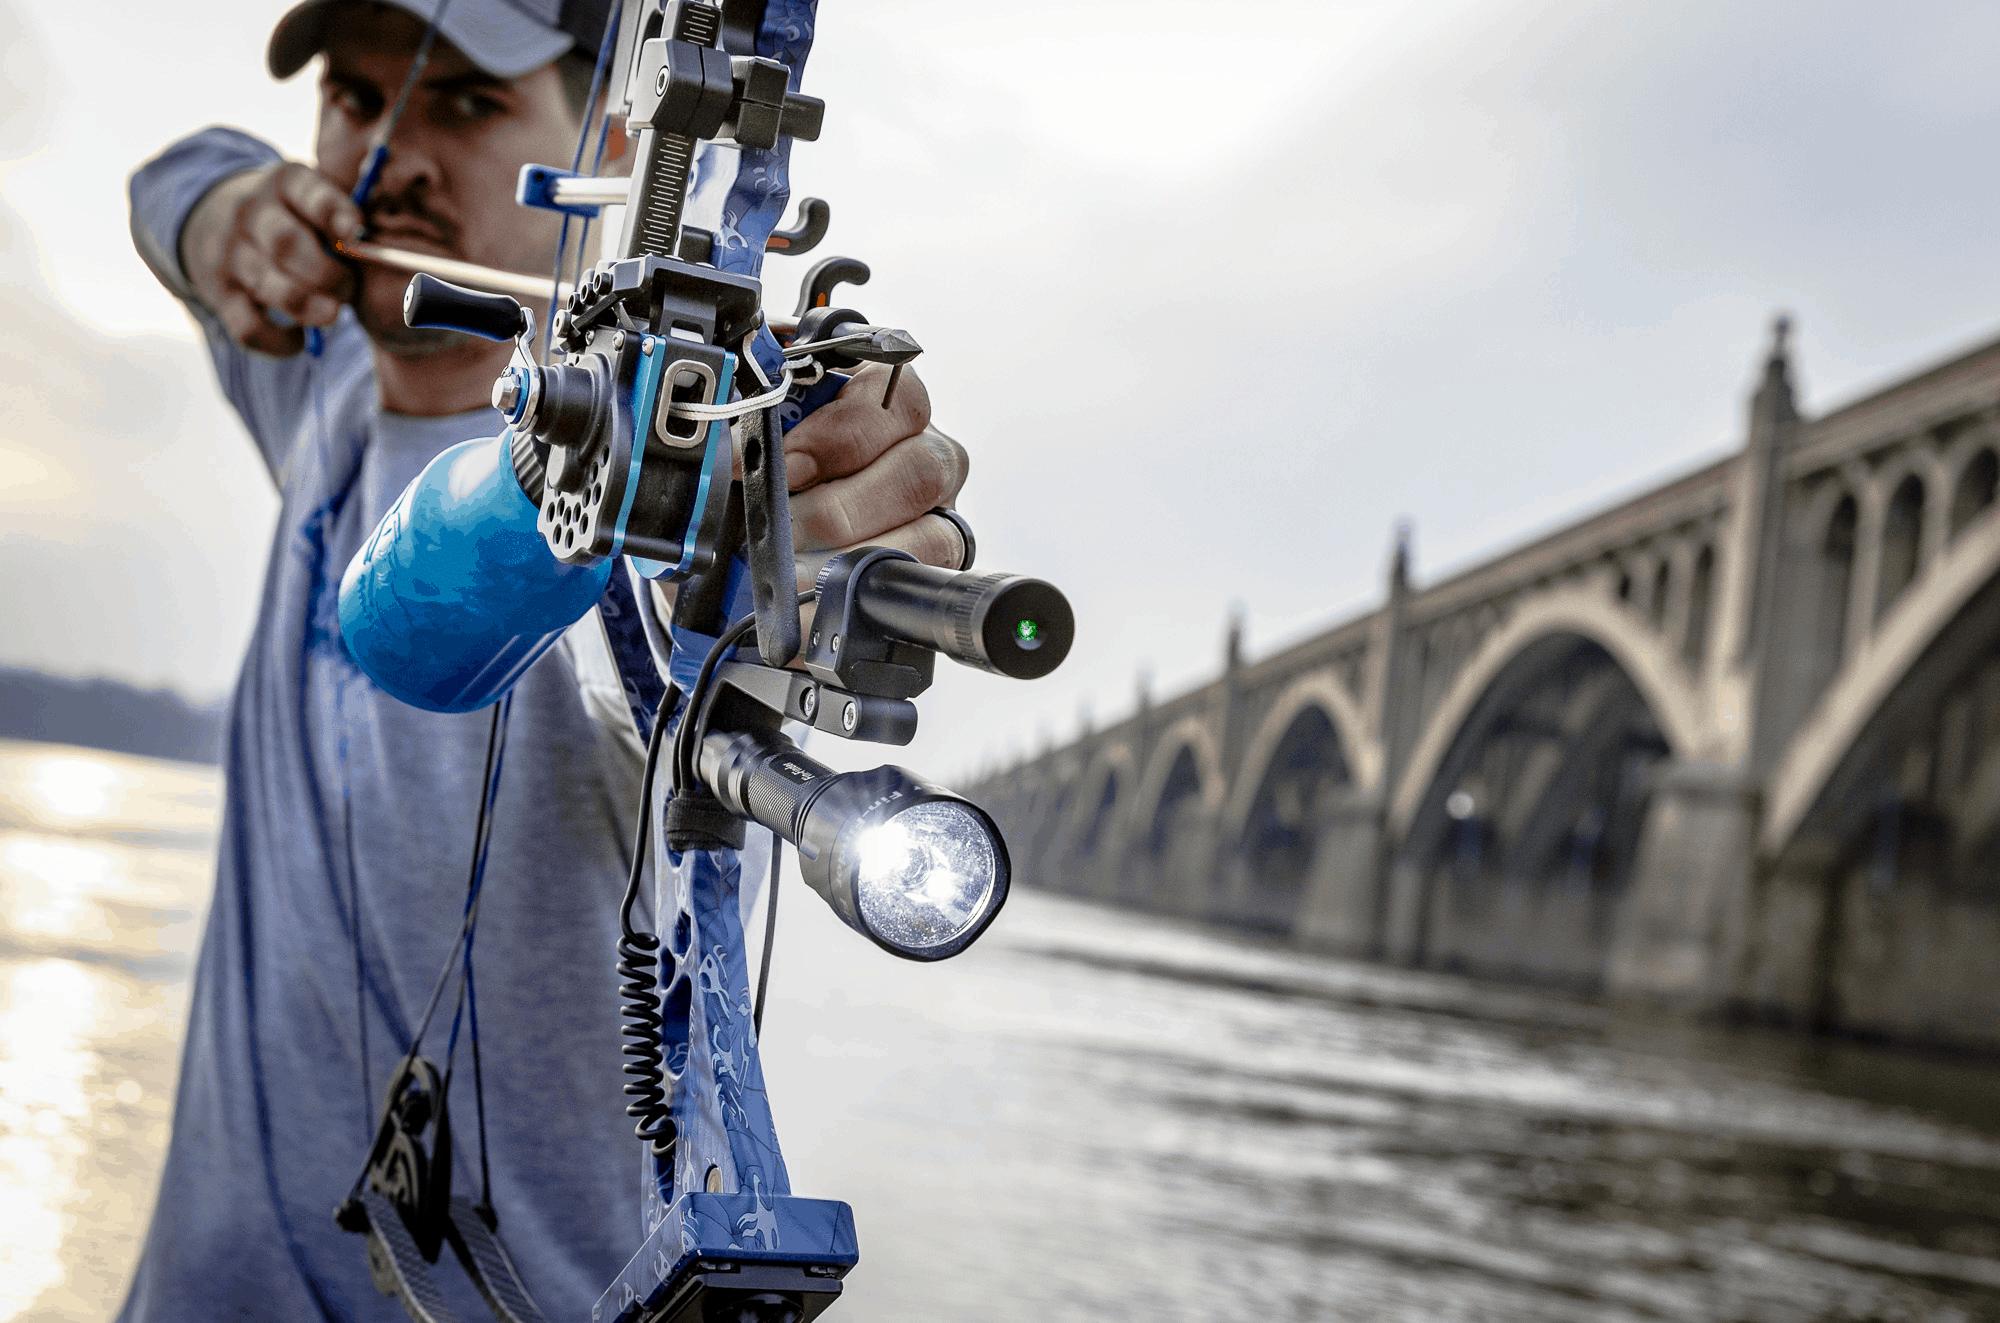 tuning bowfising bow